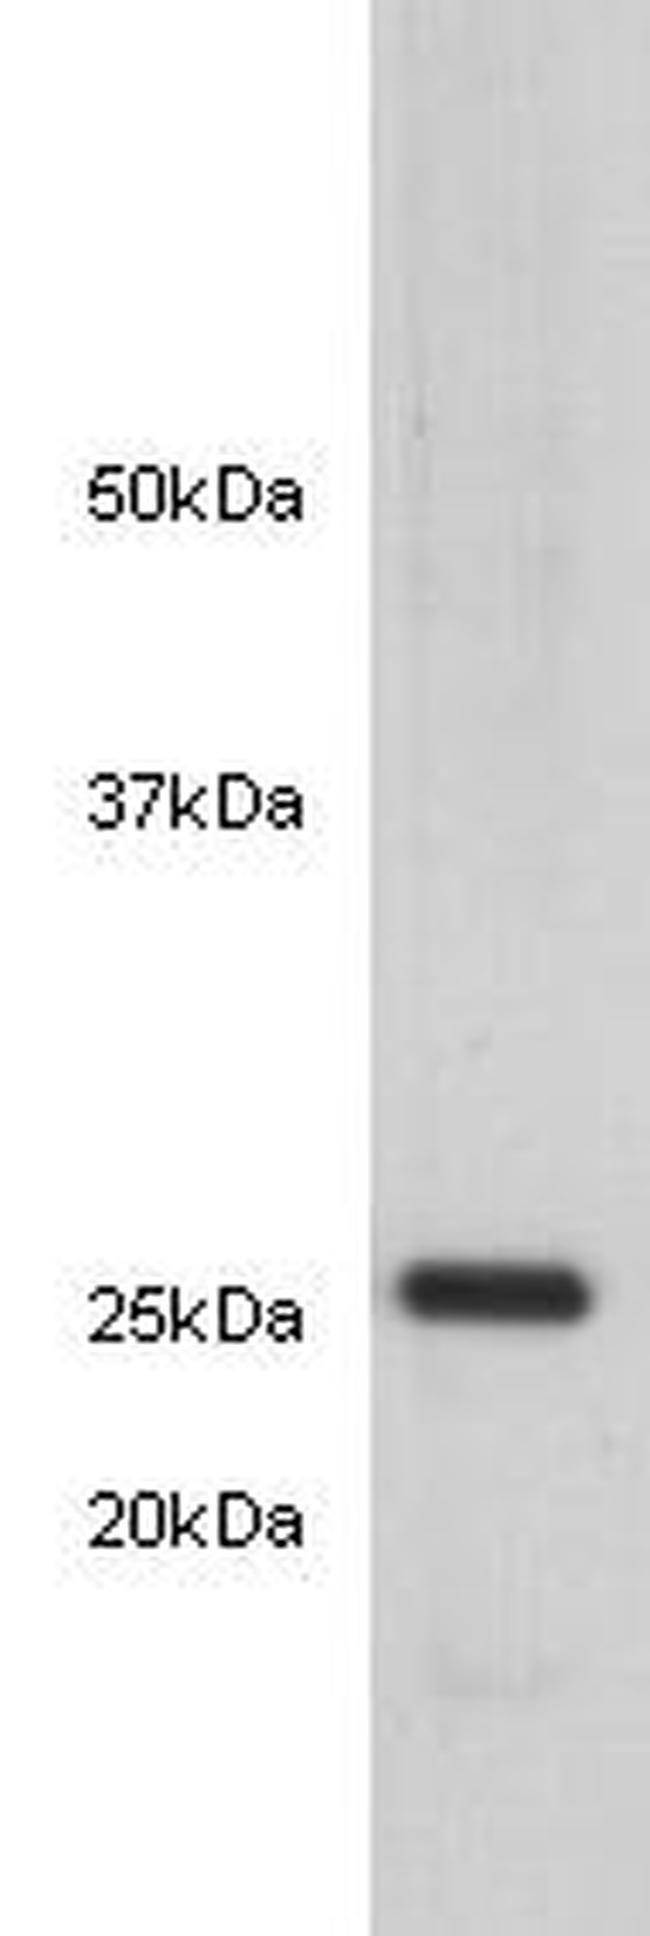 14-3-3 beta Antibody in Western Blot (WB)